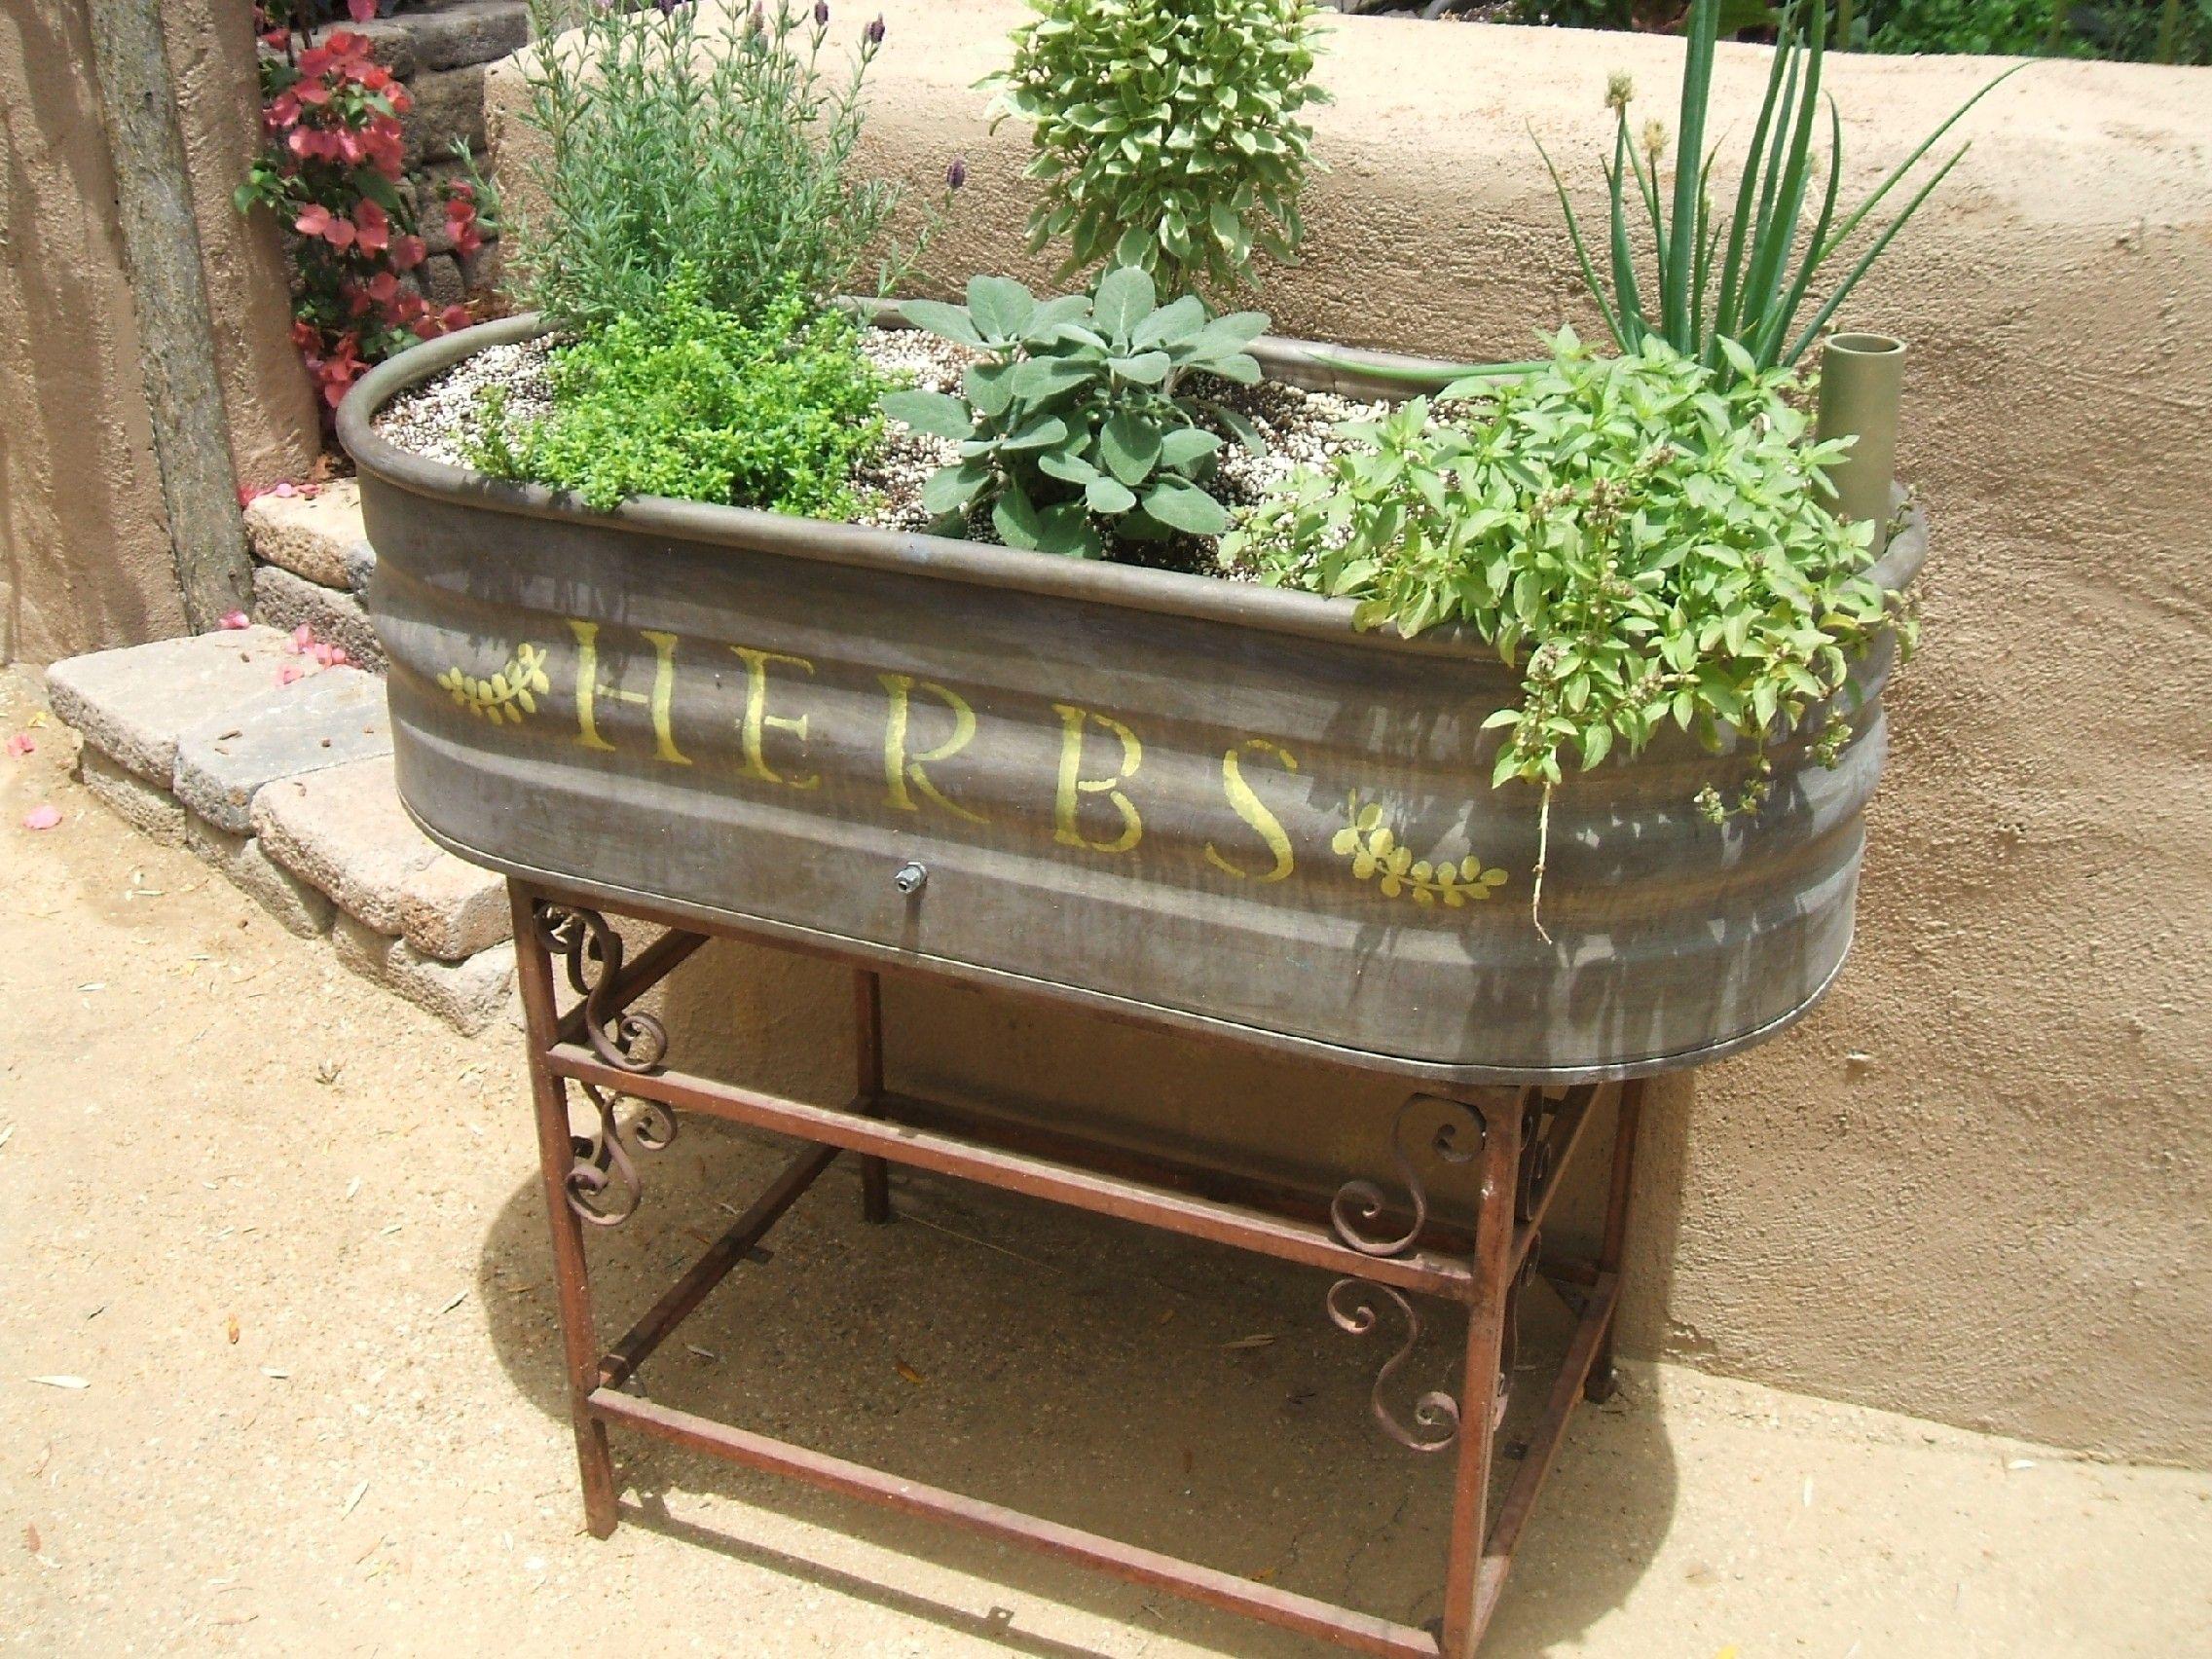 10 Patio Herb Garden Ideas Most Brilliant And Attractive Home